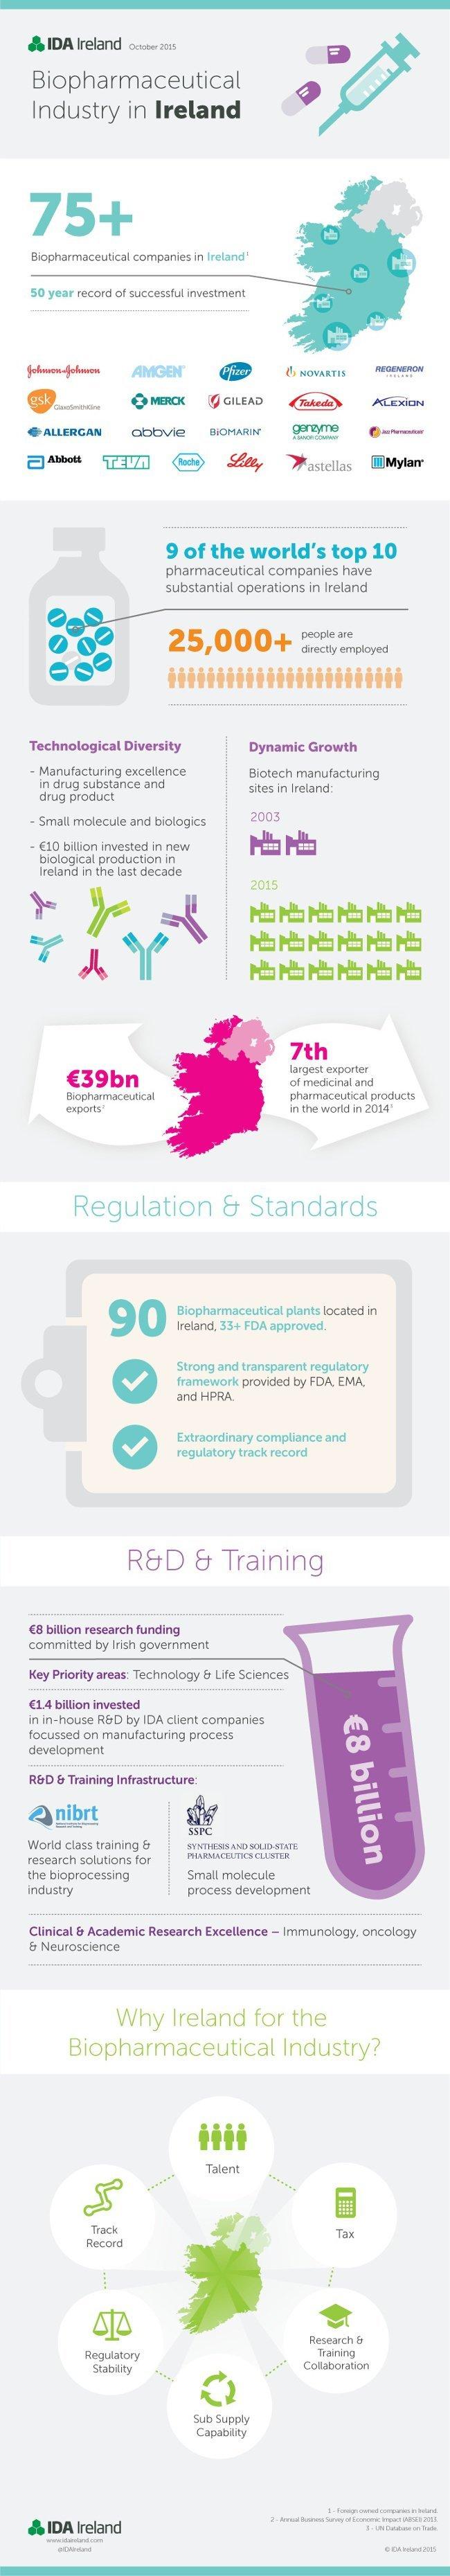 ida-biopharma-infographic